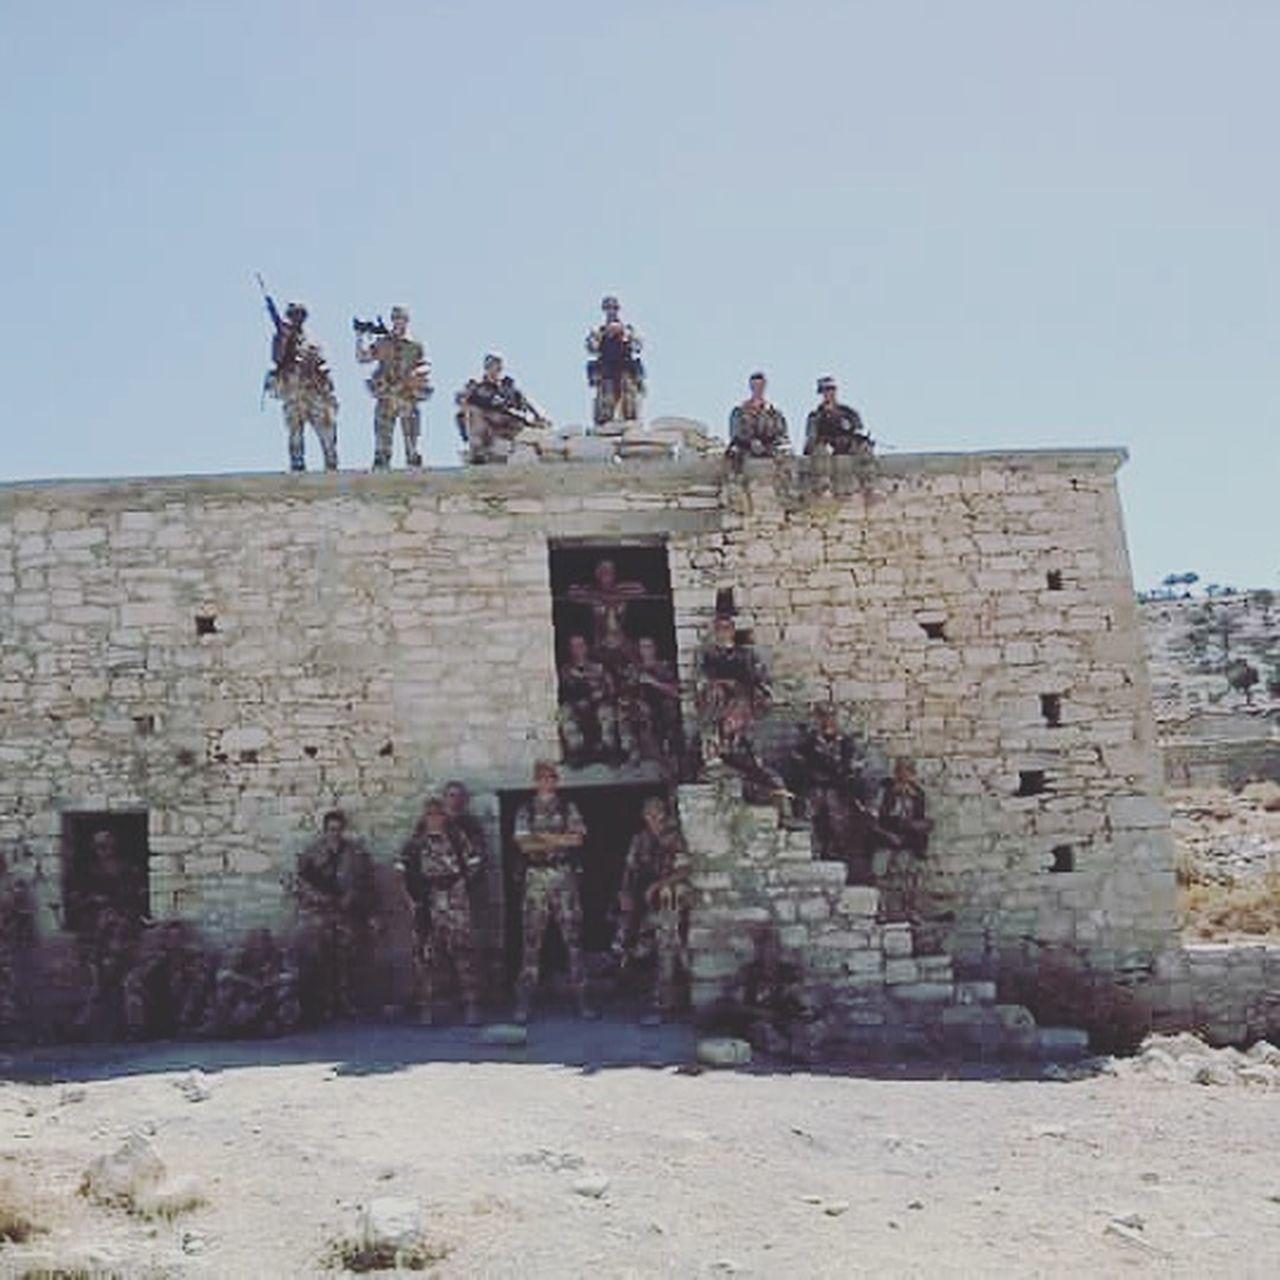 GoodTimes Goodolddays Building Exterior History Clear Sky Outdoors Playground Army Hooah!!! ArmyDays Army Life Abandoned TheLads EyeEmNewHere